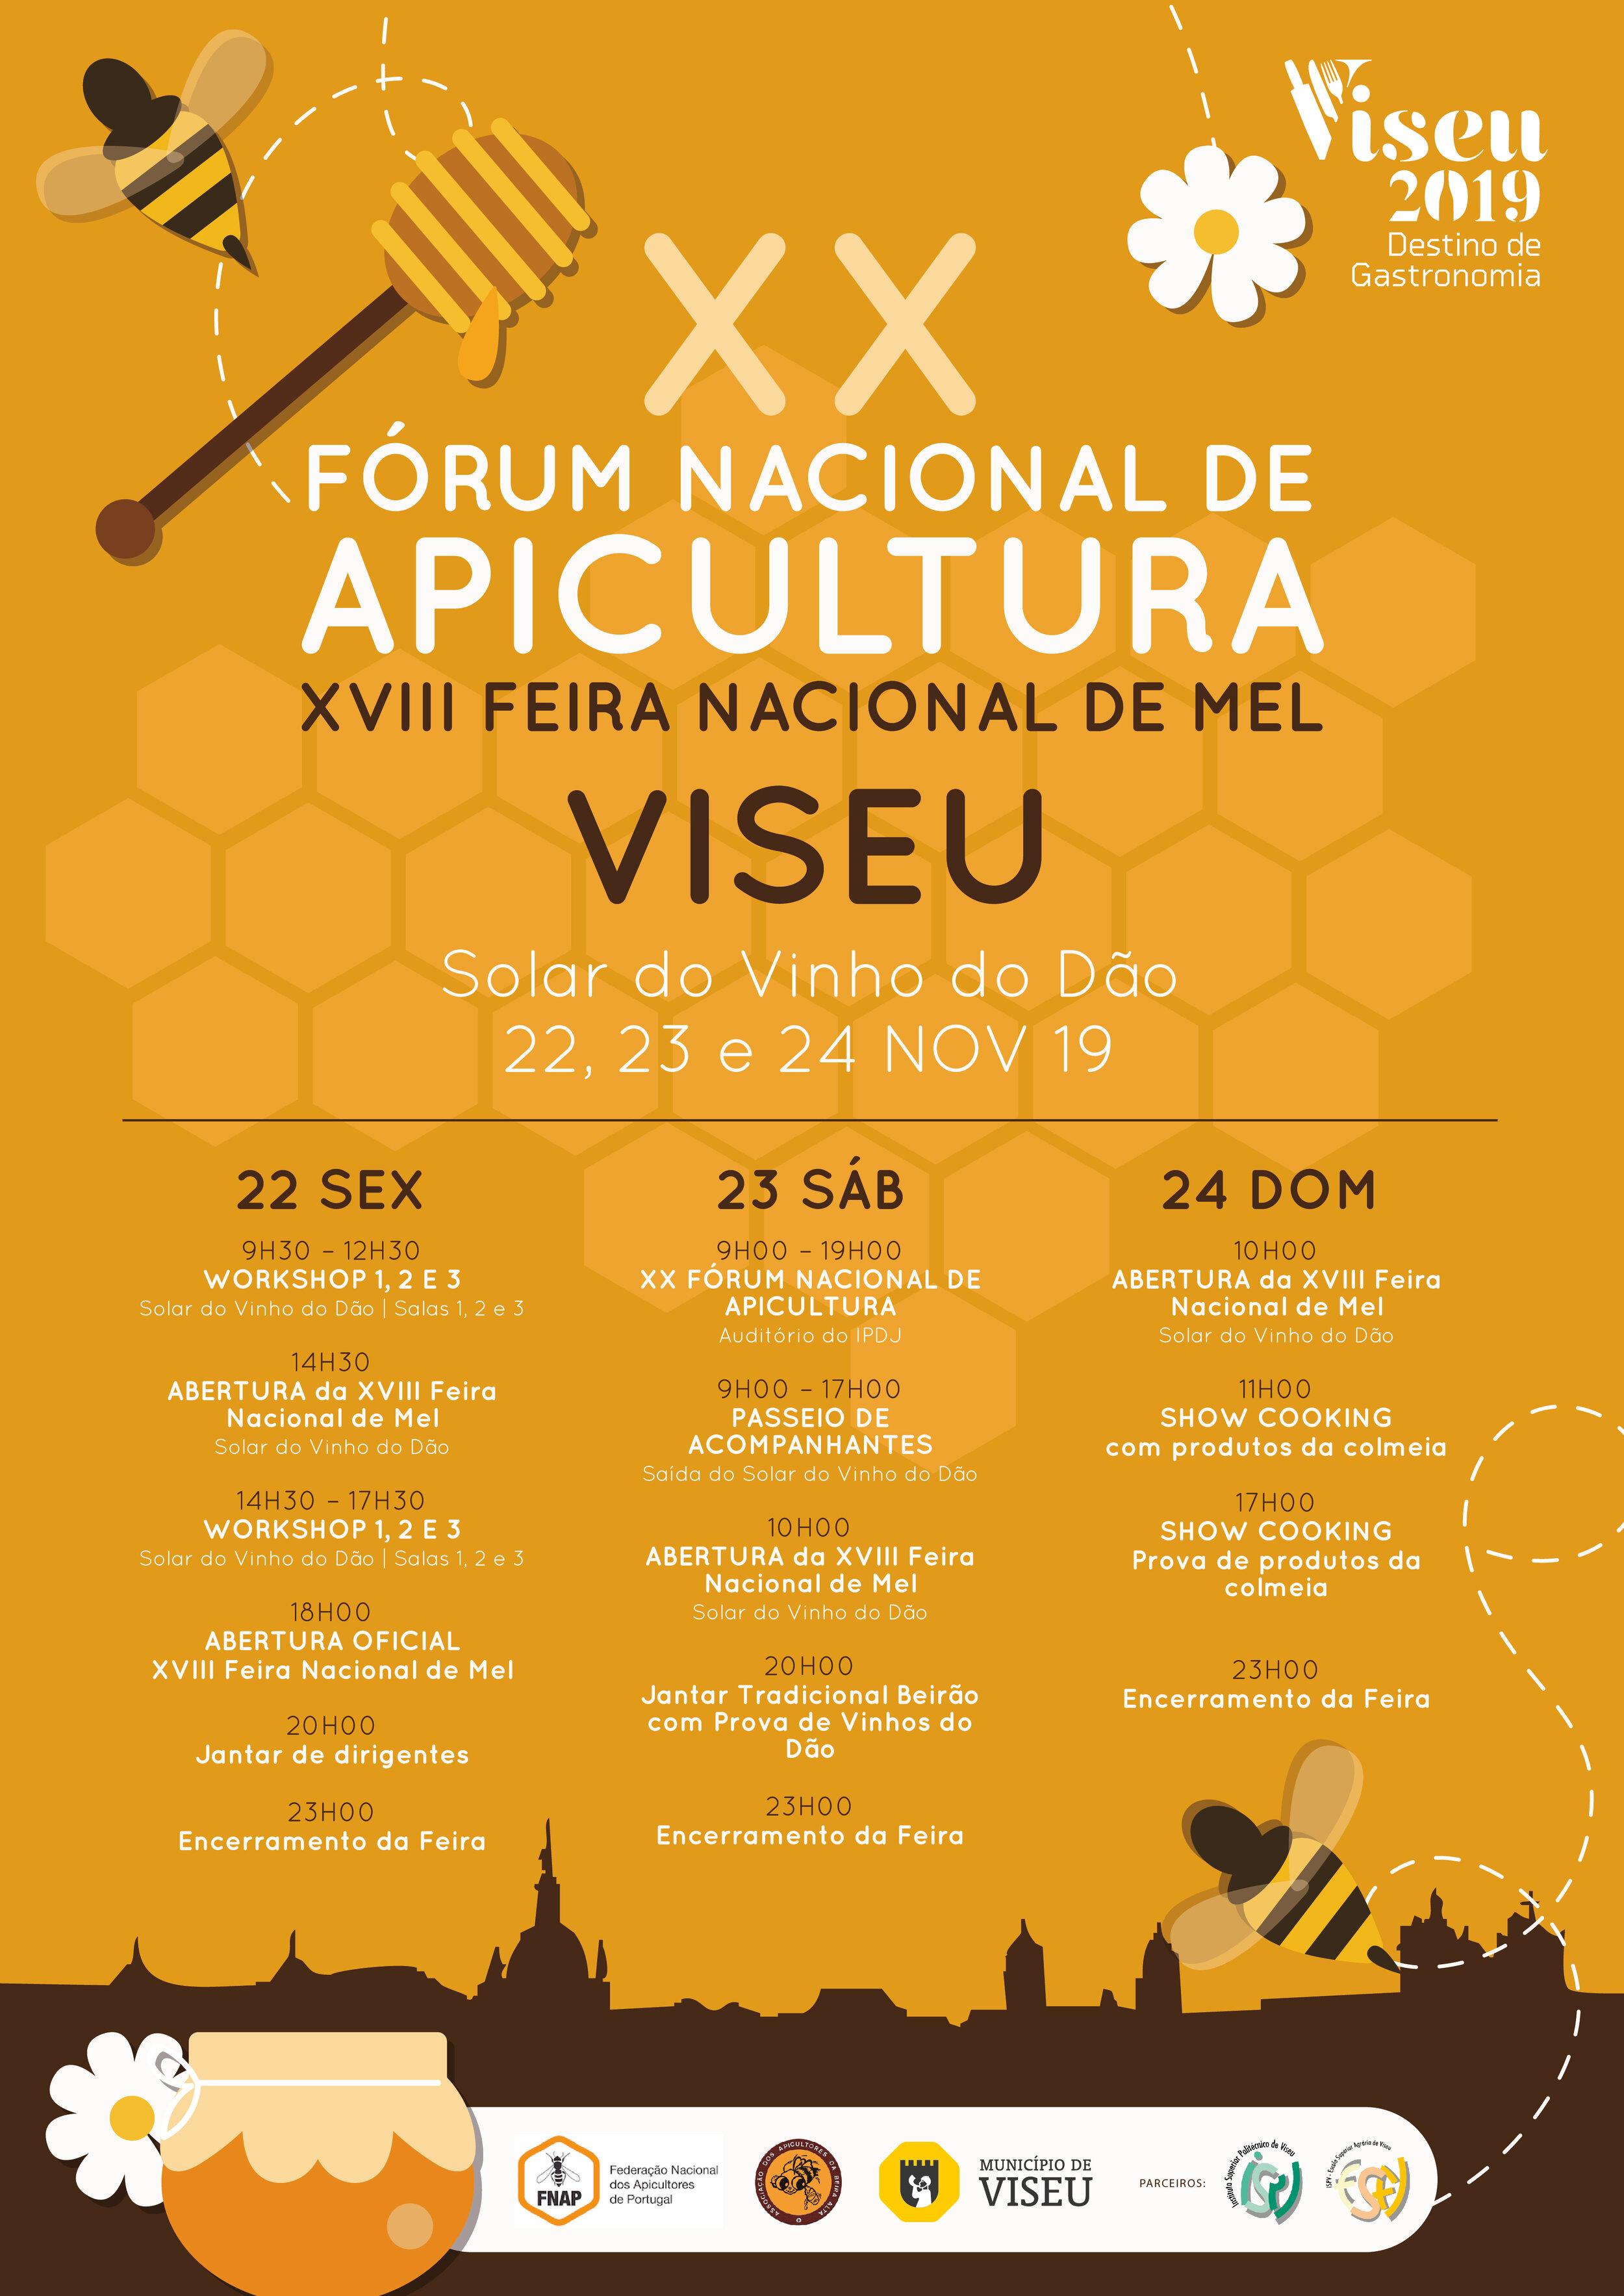 ProgramaA3-ForumApiculturaViseu2019-01.jpg